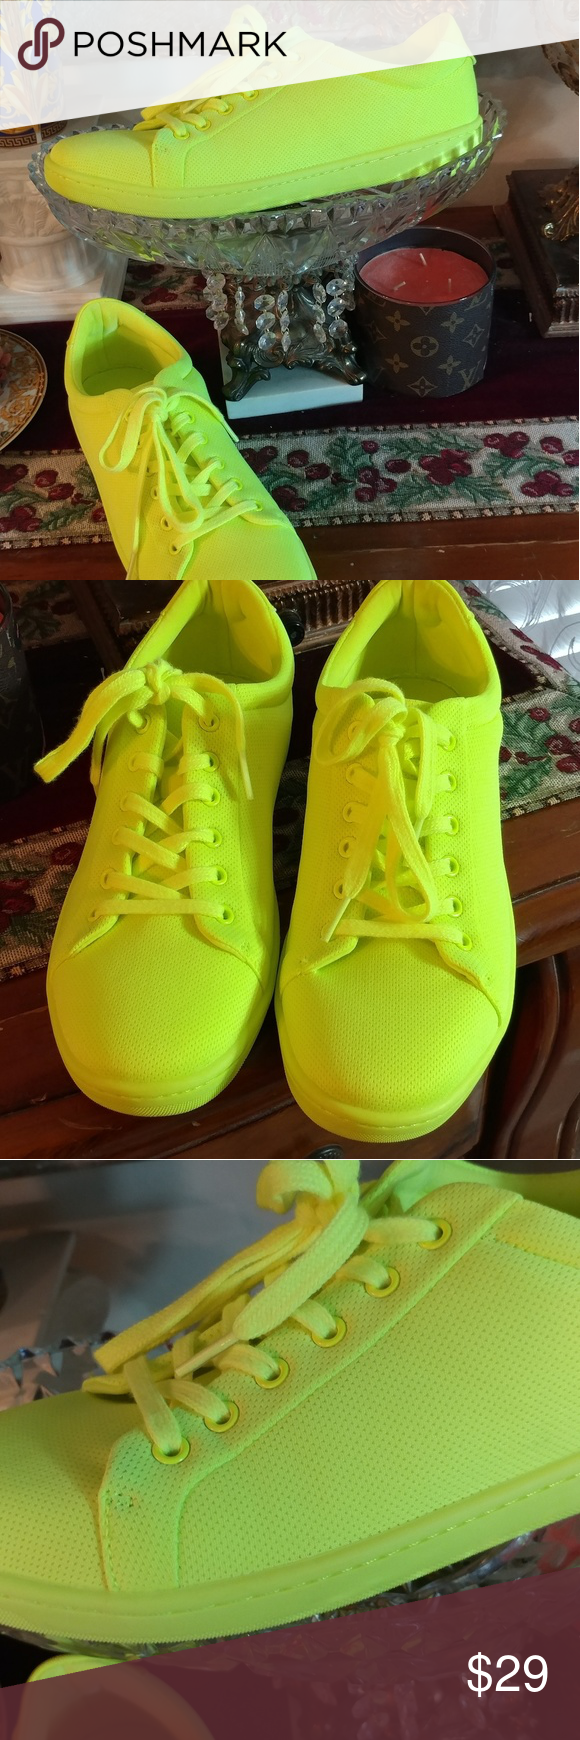 ZARA COLLECTION Fashion Neon Sneakers